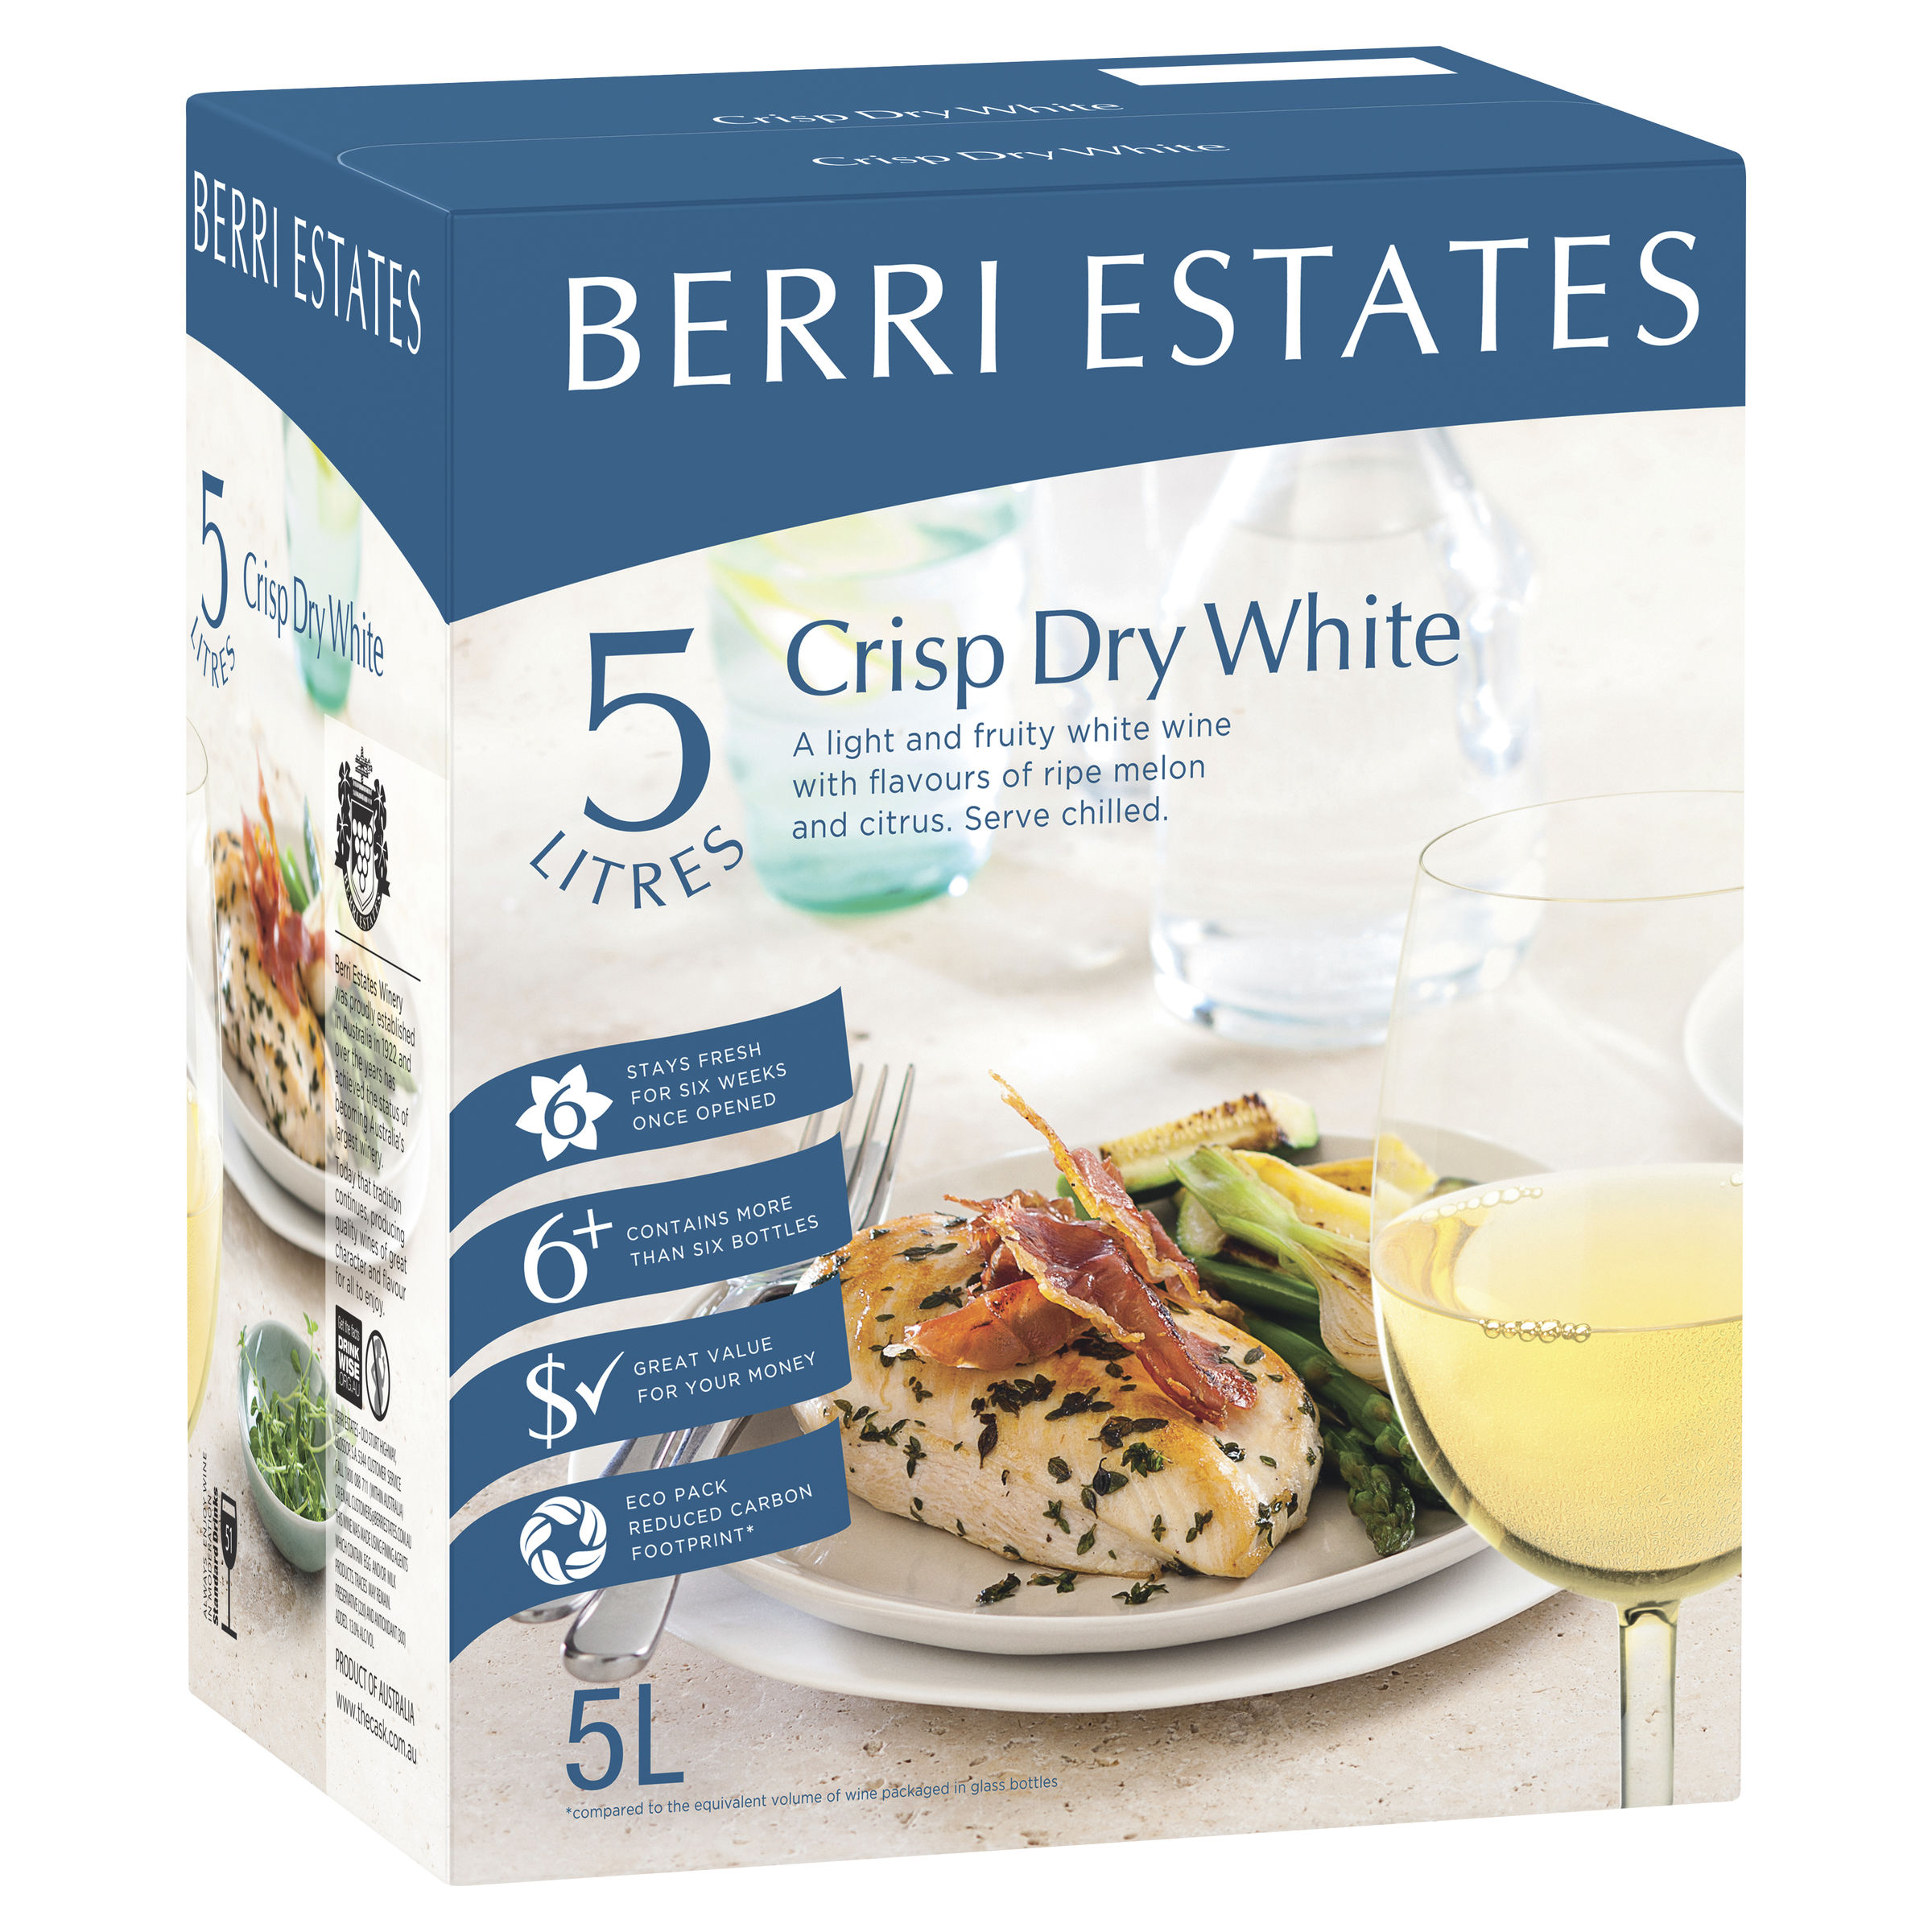 BERRI ESTATES CRISP DRY WHITE CHABLIS